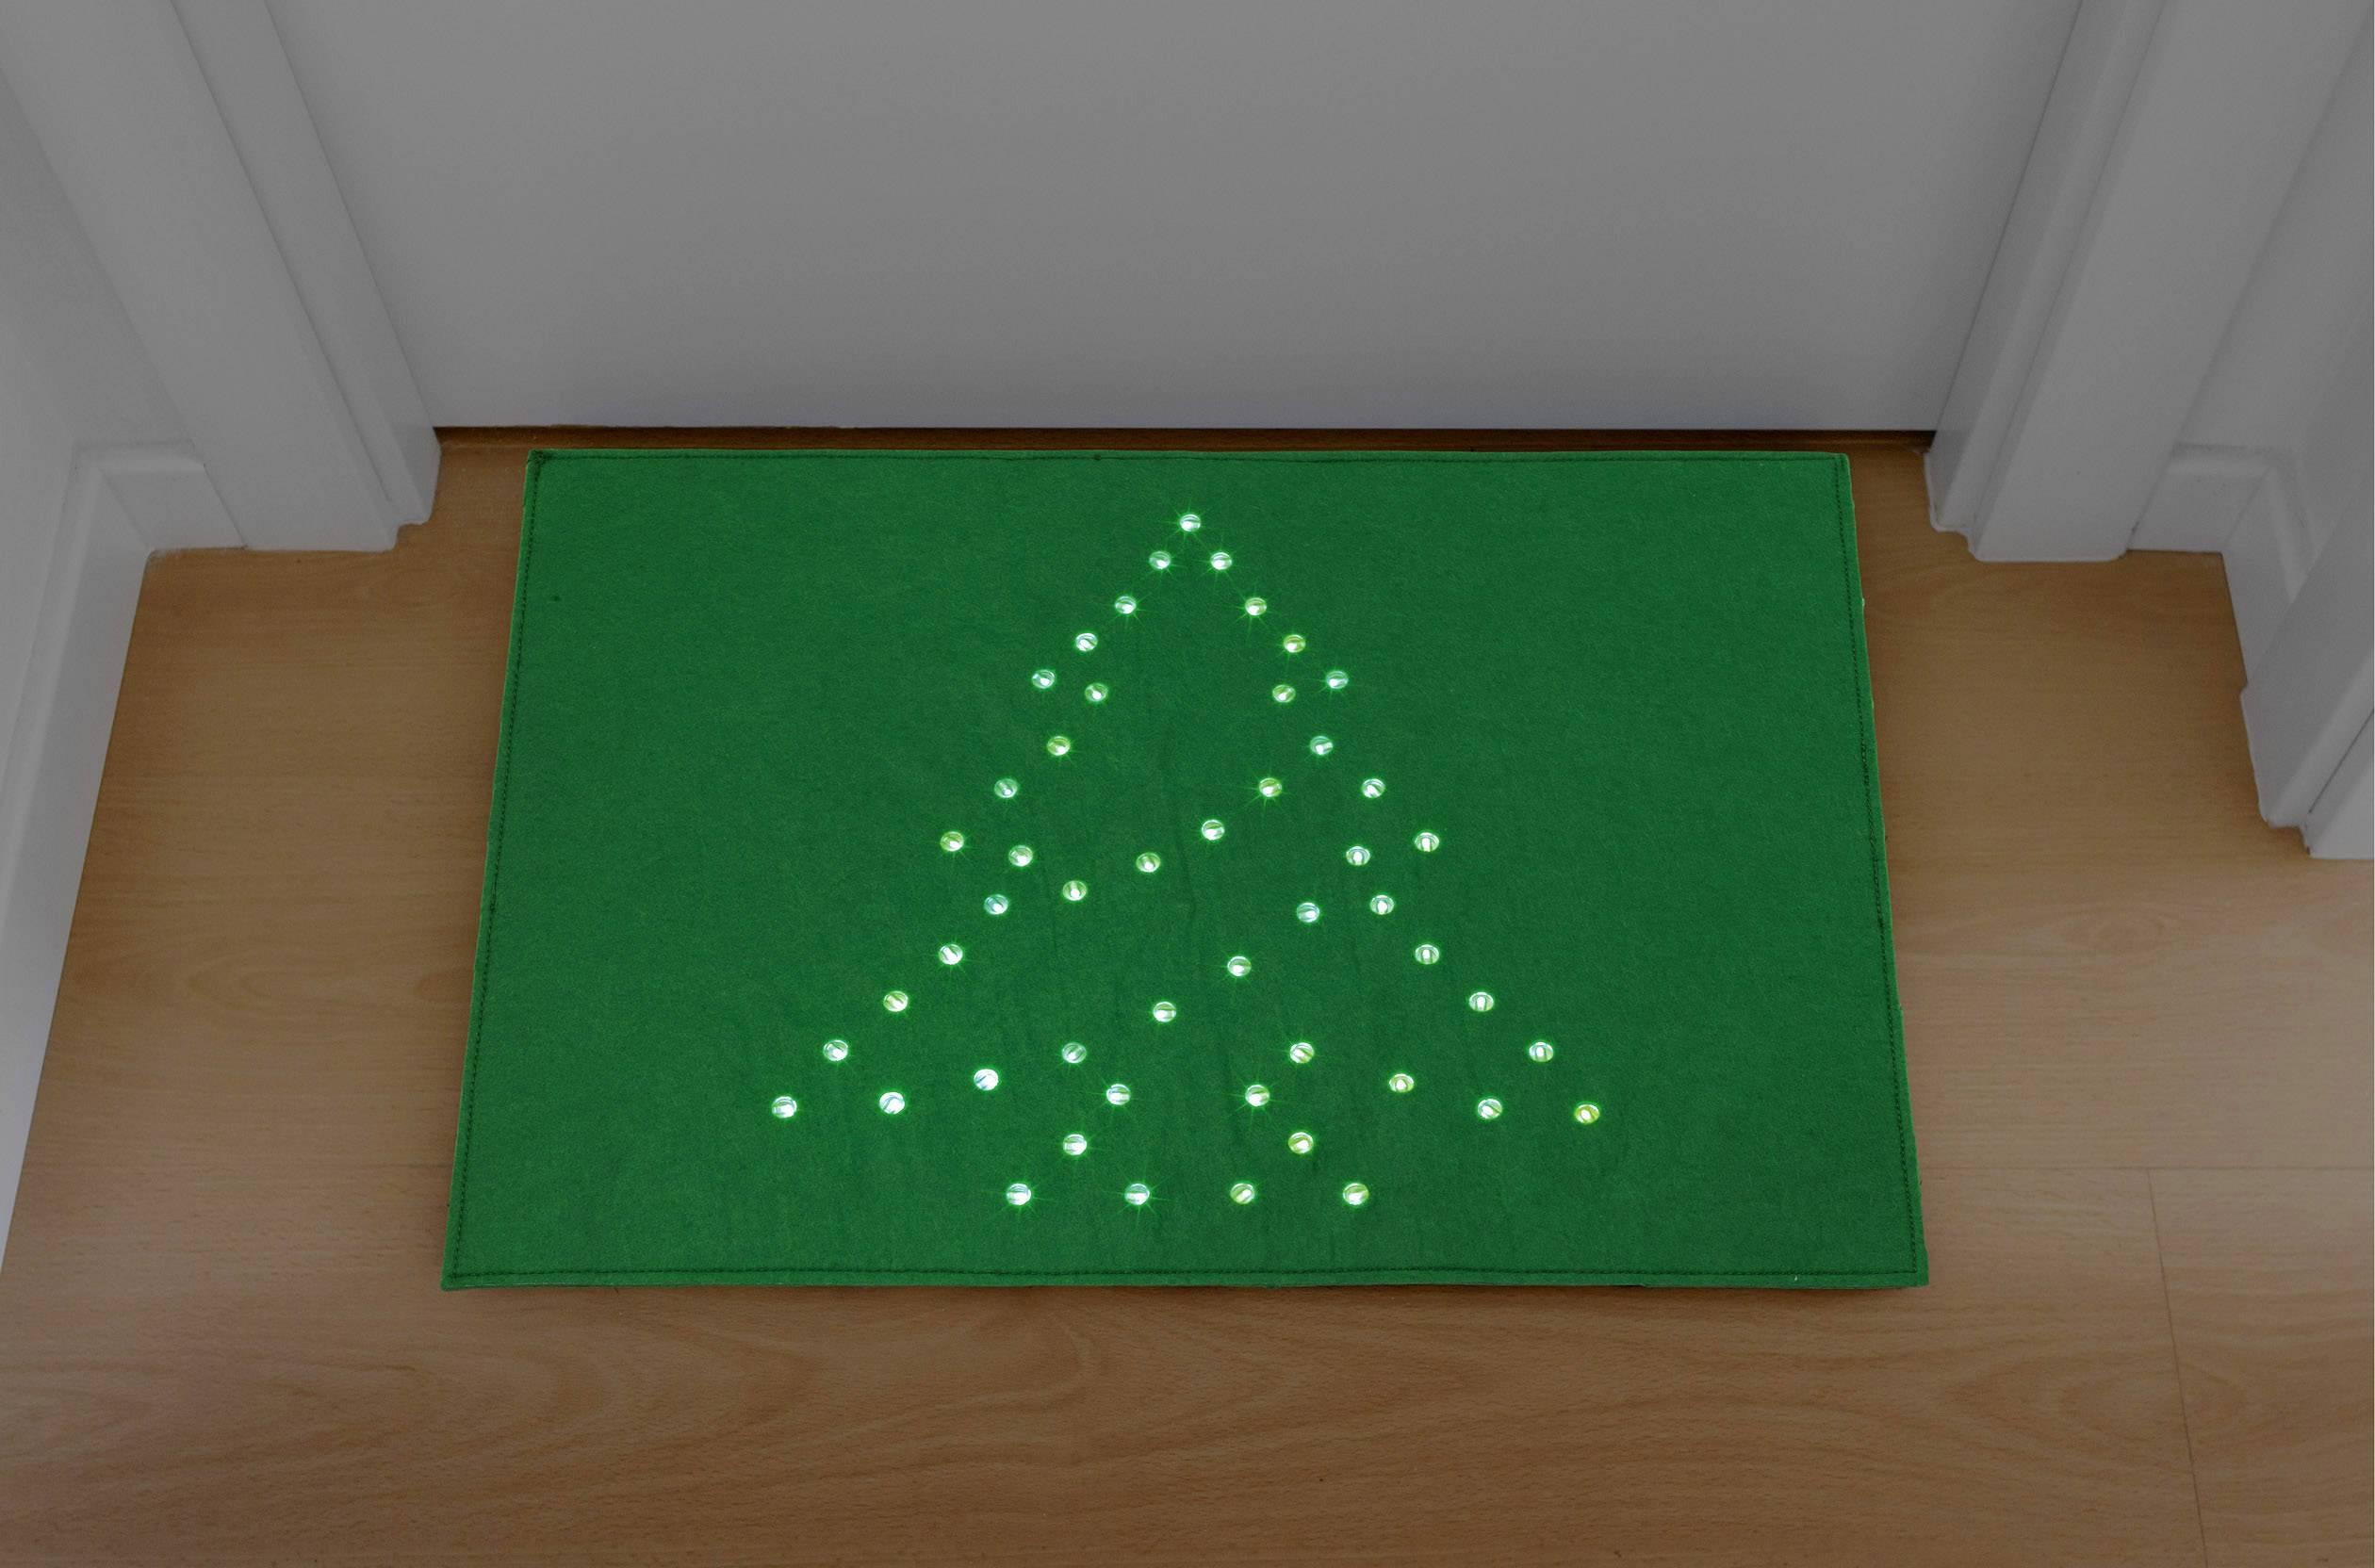 Groen Led Licht : Decoratief led licht deurmat kerstboom groen led groen polarlite